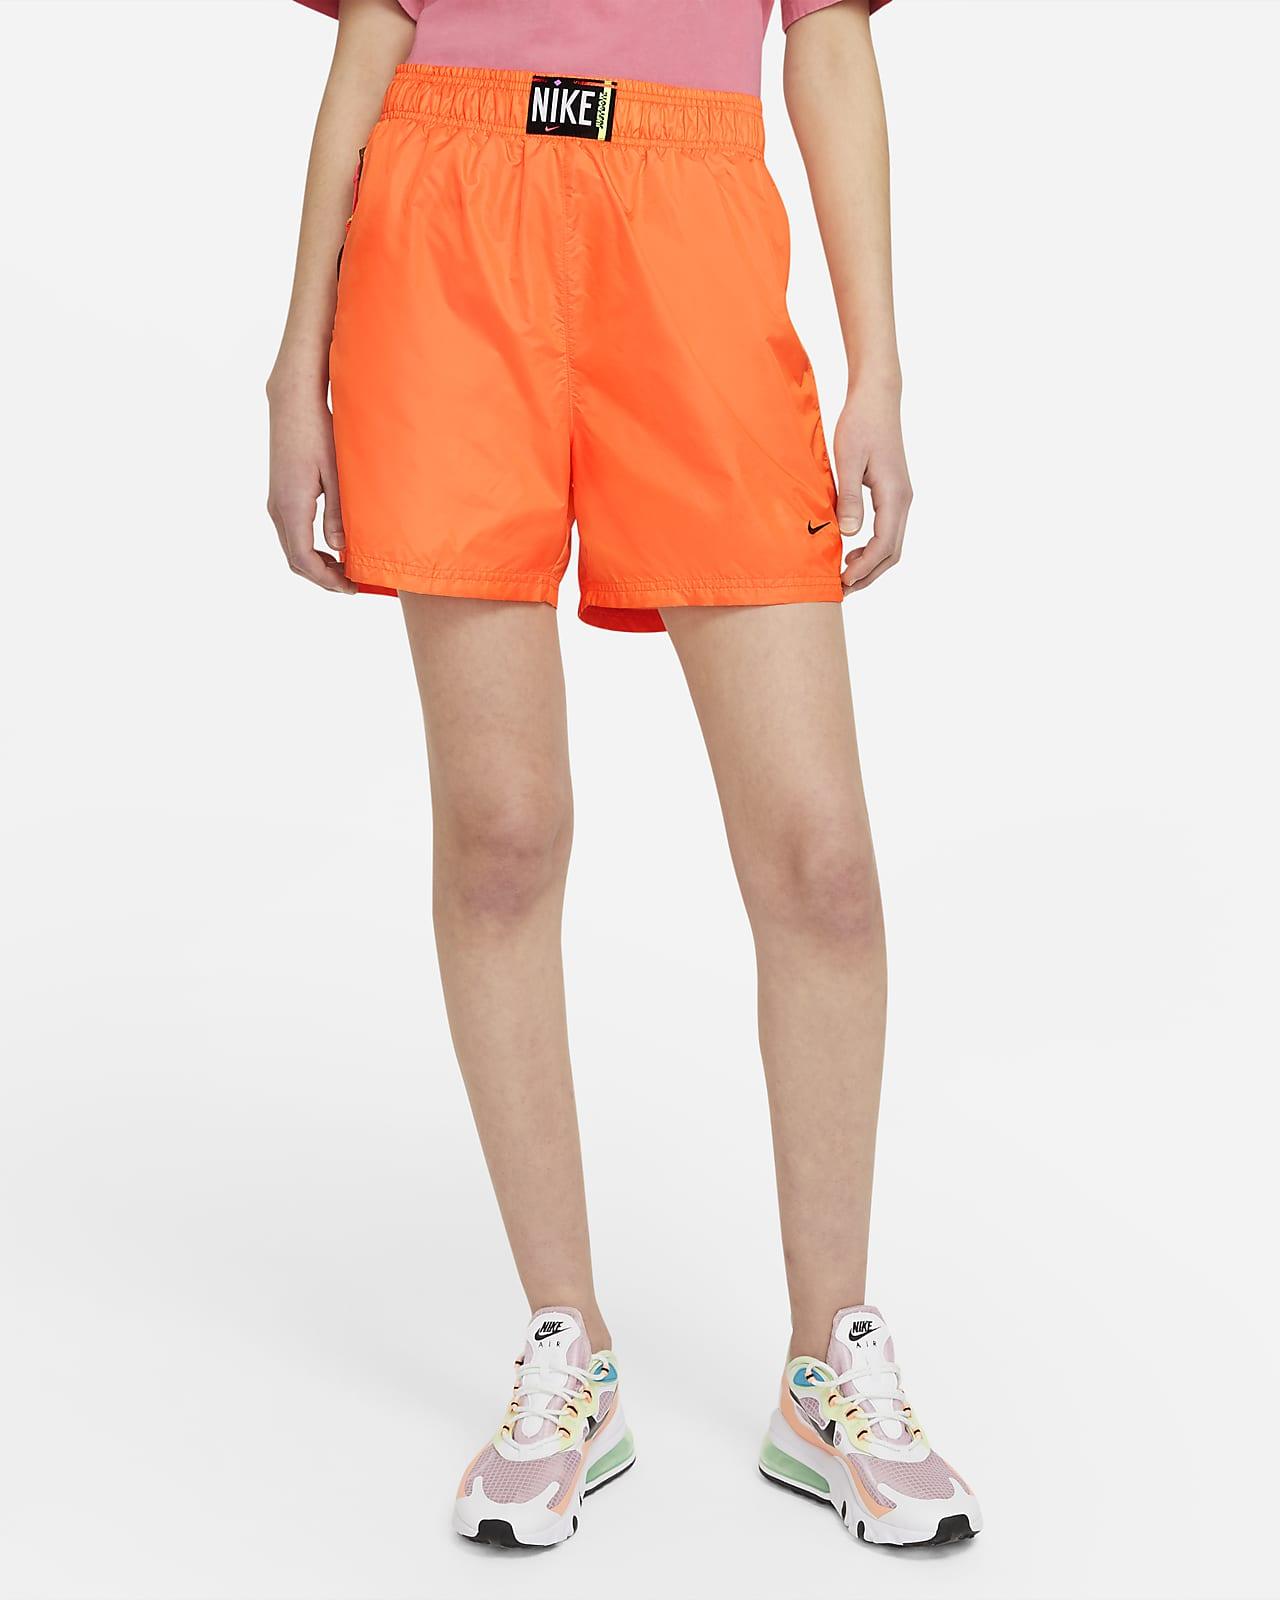 Nike Sportswear 女子梭织短裤